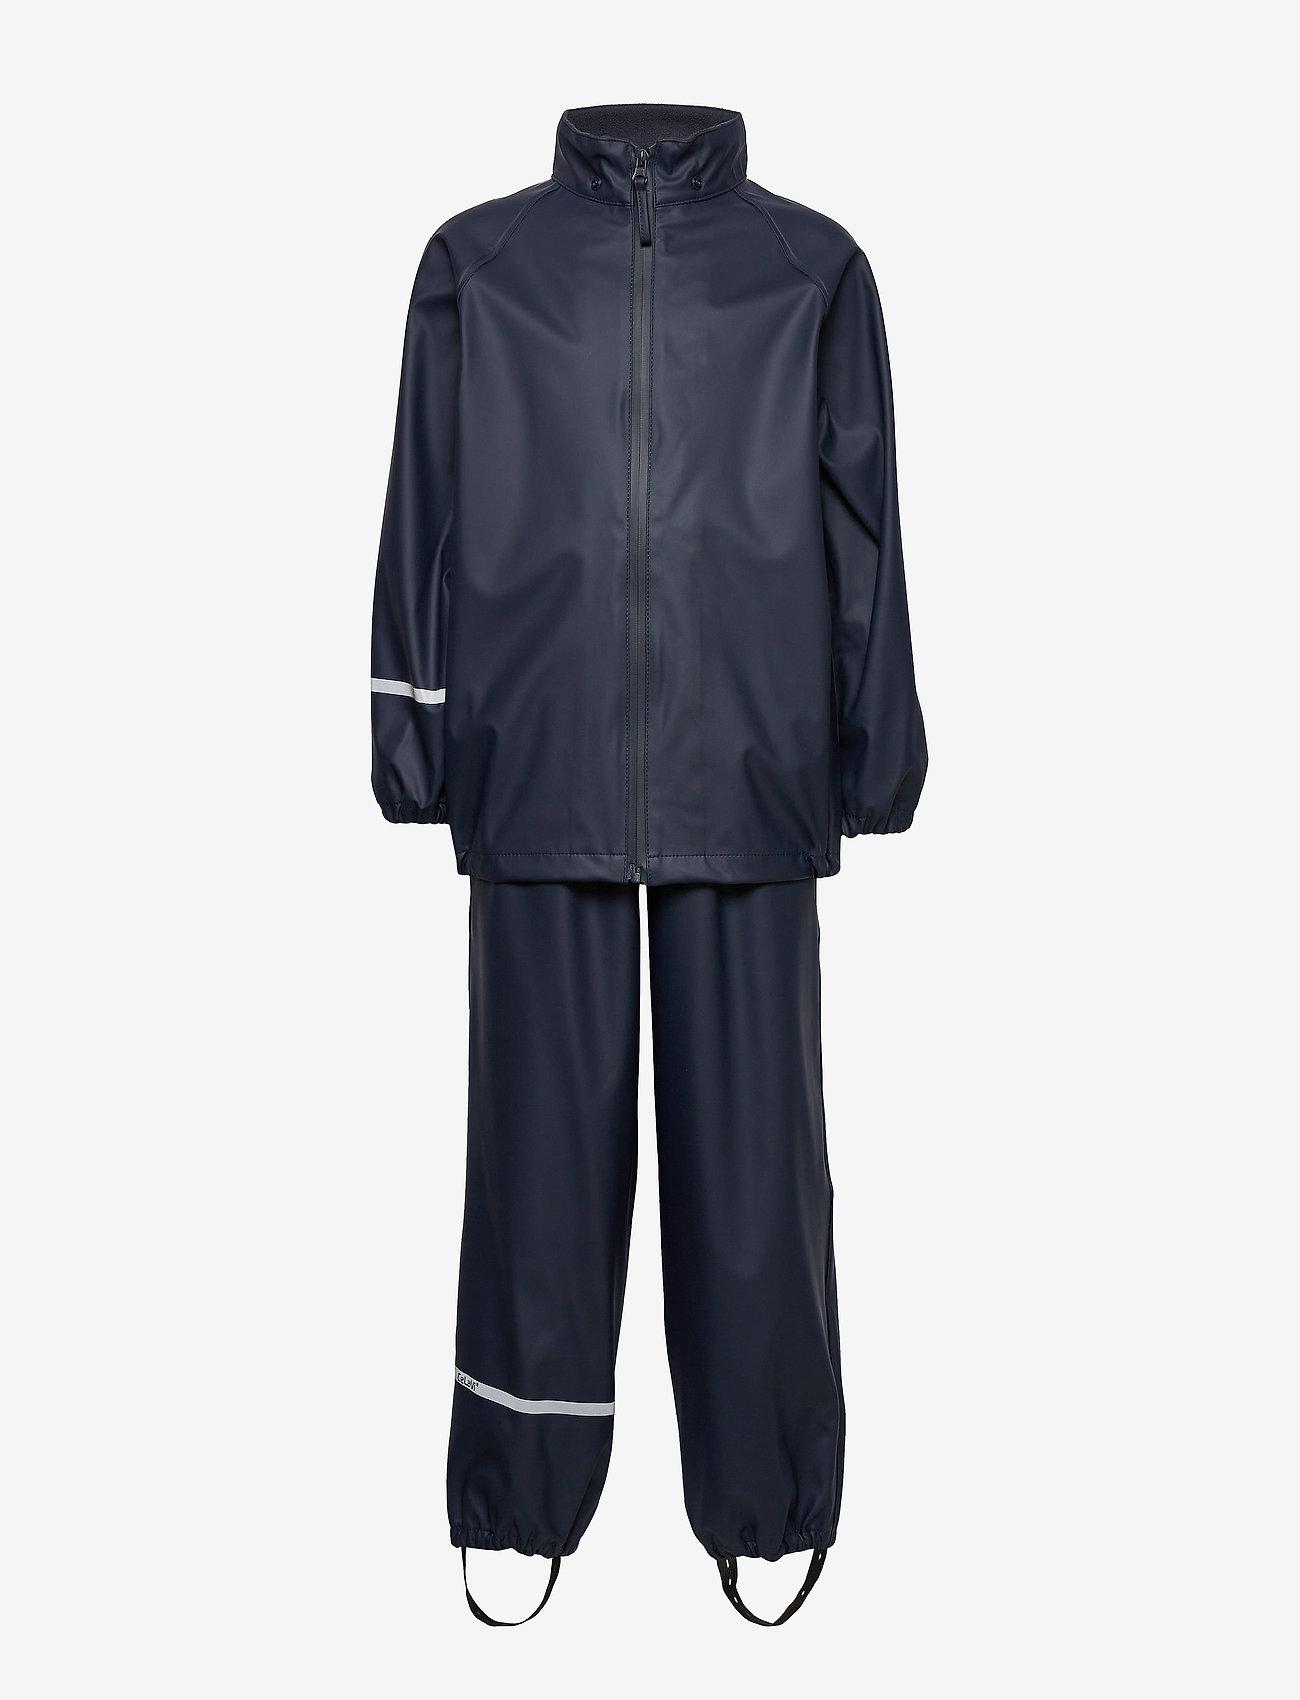 CeLaVi - Basic rainwear set -Recycle PU - sets & suits - dark navy - 1